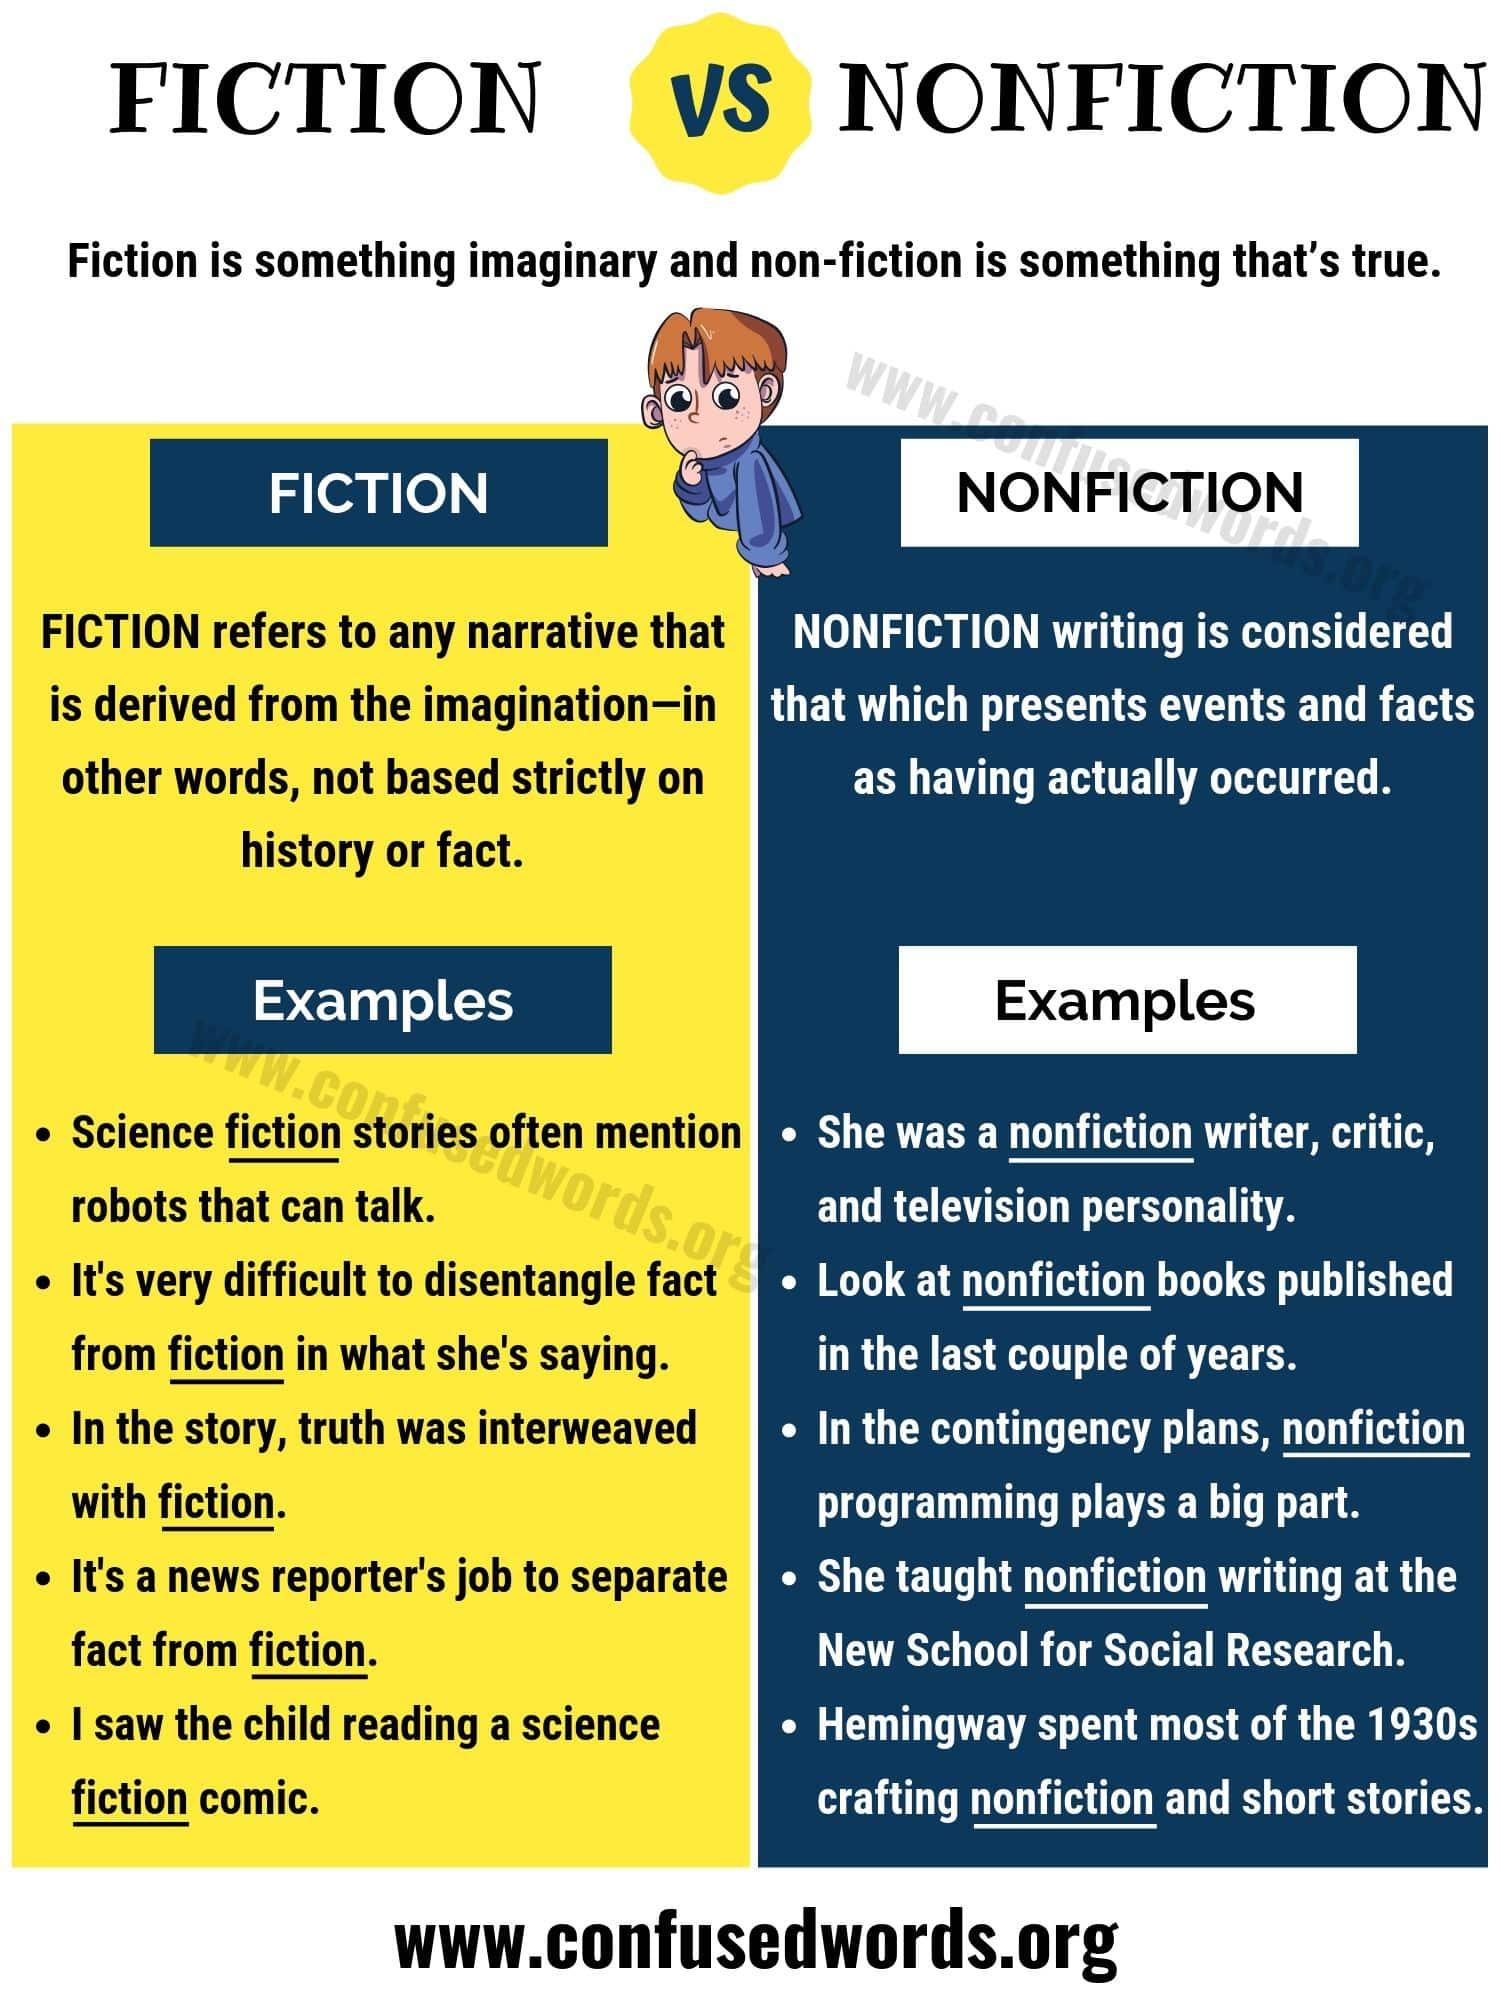 Fiction Vs Nonfiction How To Use Fiction And Nonfiction